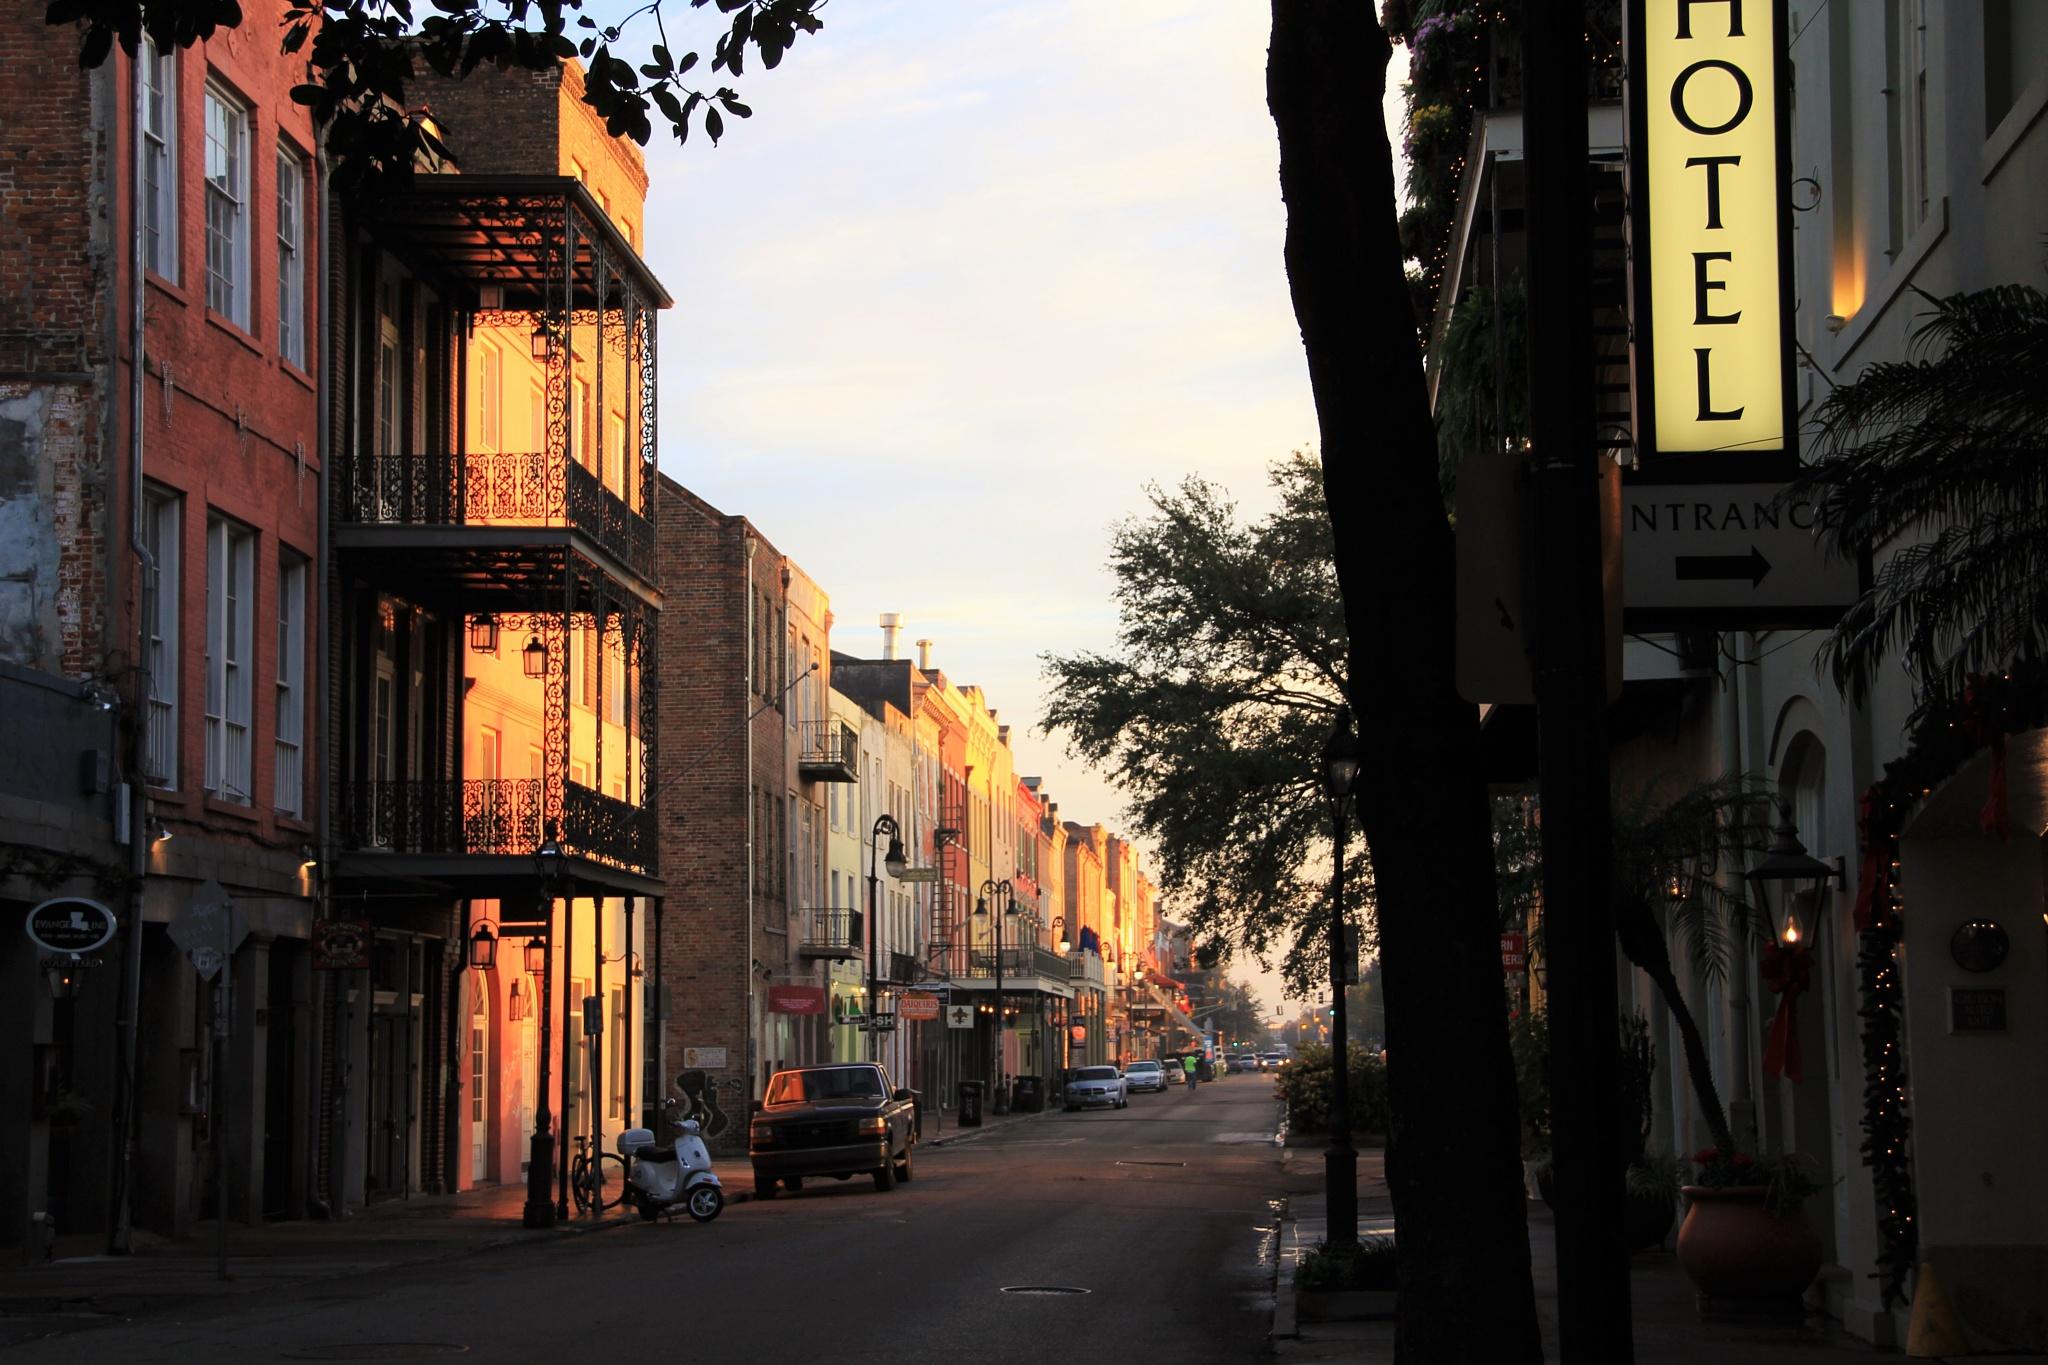 French Quarter of New Orleans, LA at Sunrise by Kreg De Groff